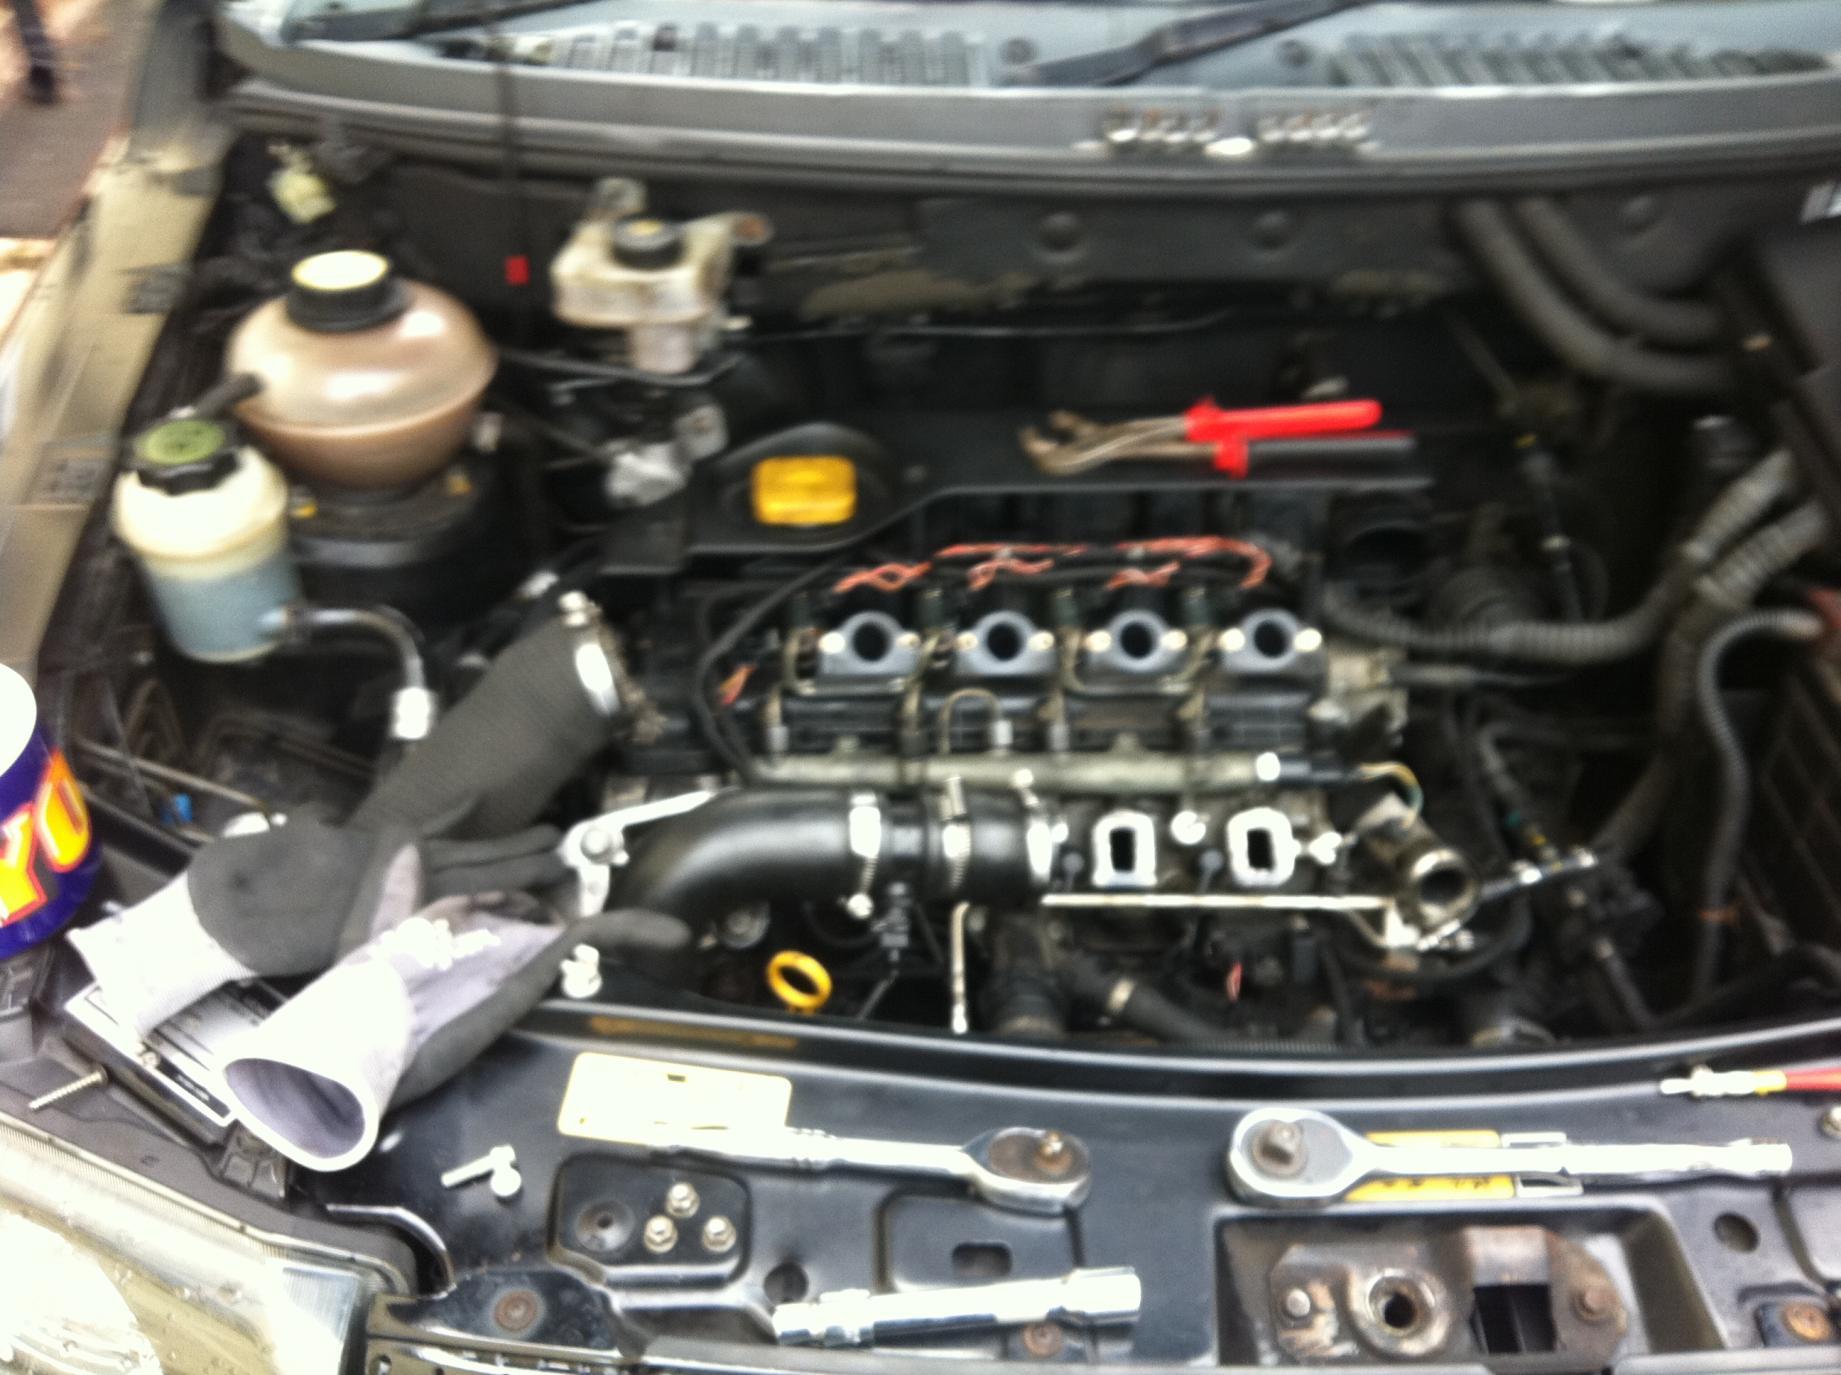 Boost pressure sensor (map sensor) fitting | LandyZone - Land Rover